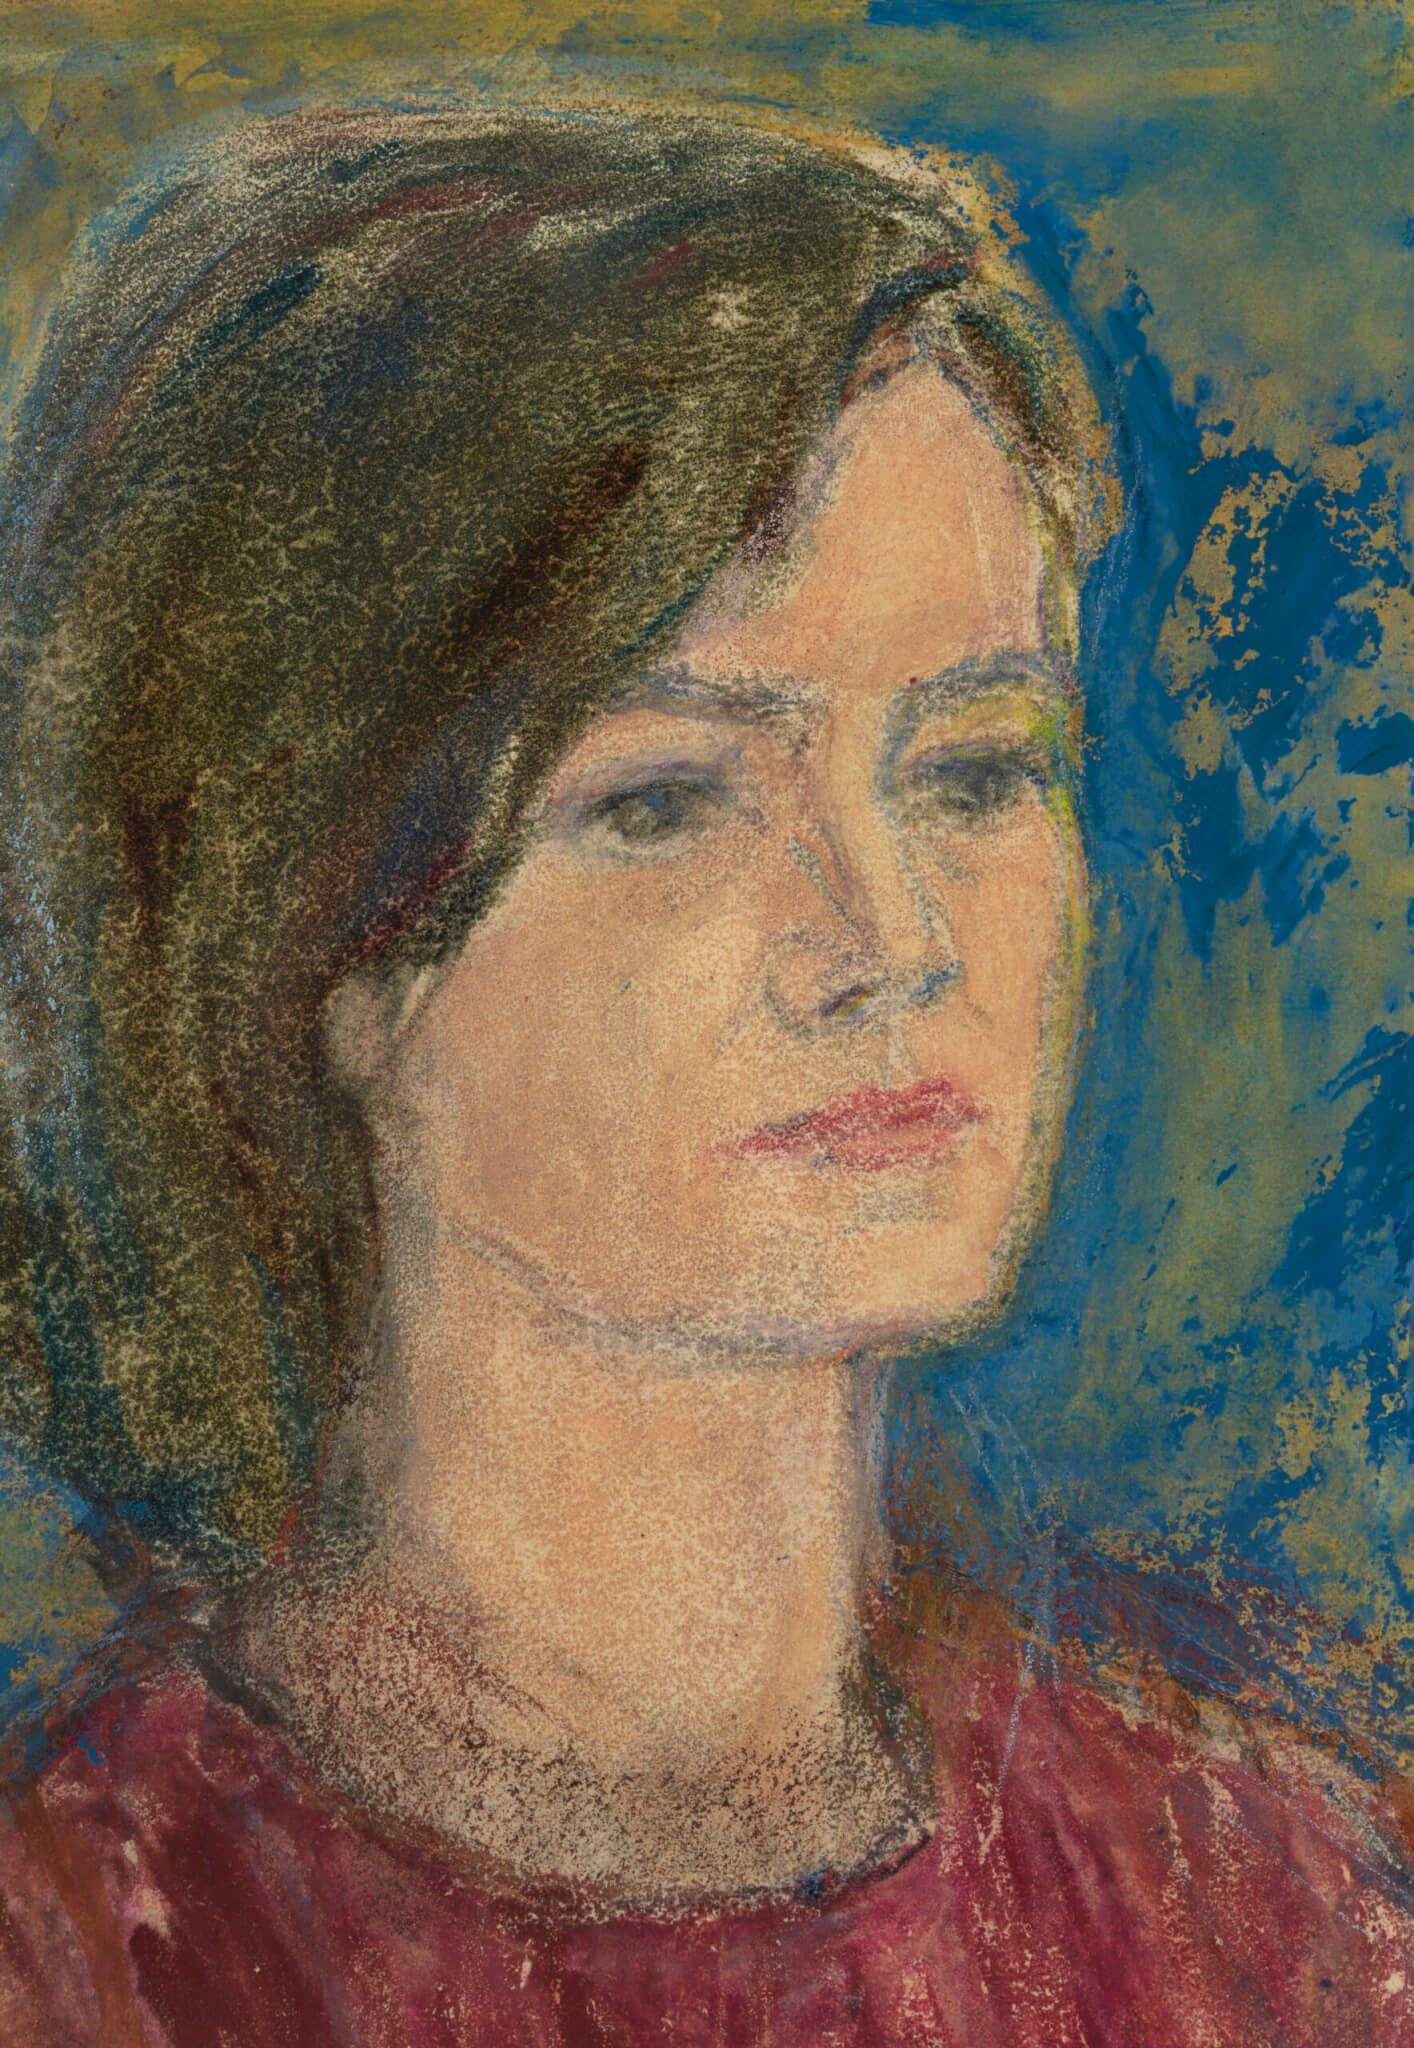 Aino-Bach-Allee-galerii-kunstiklassika-oksjon-2020